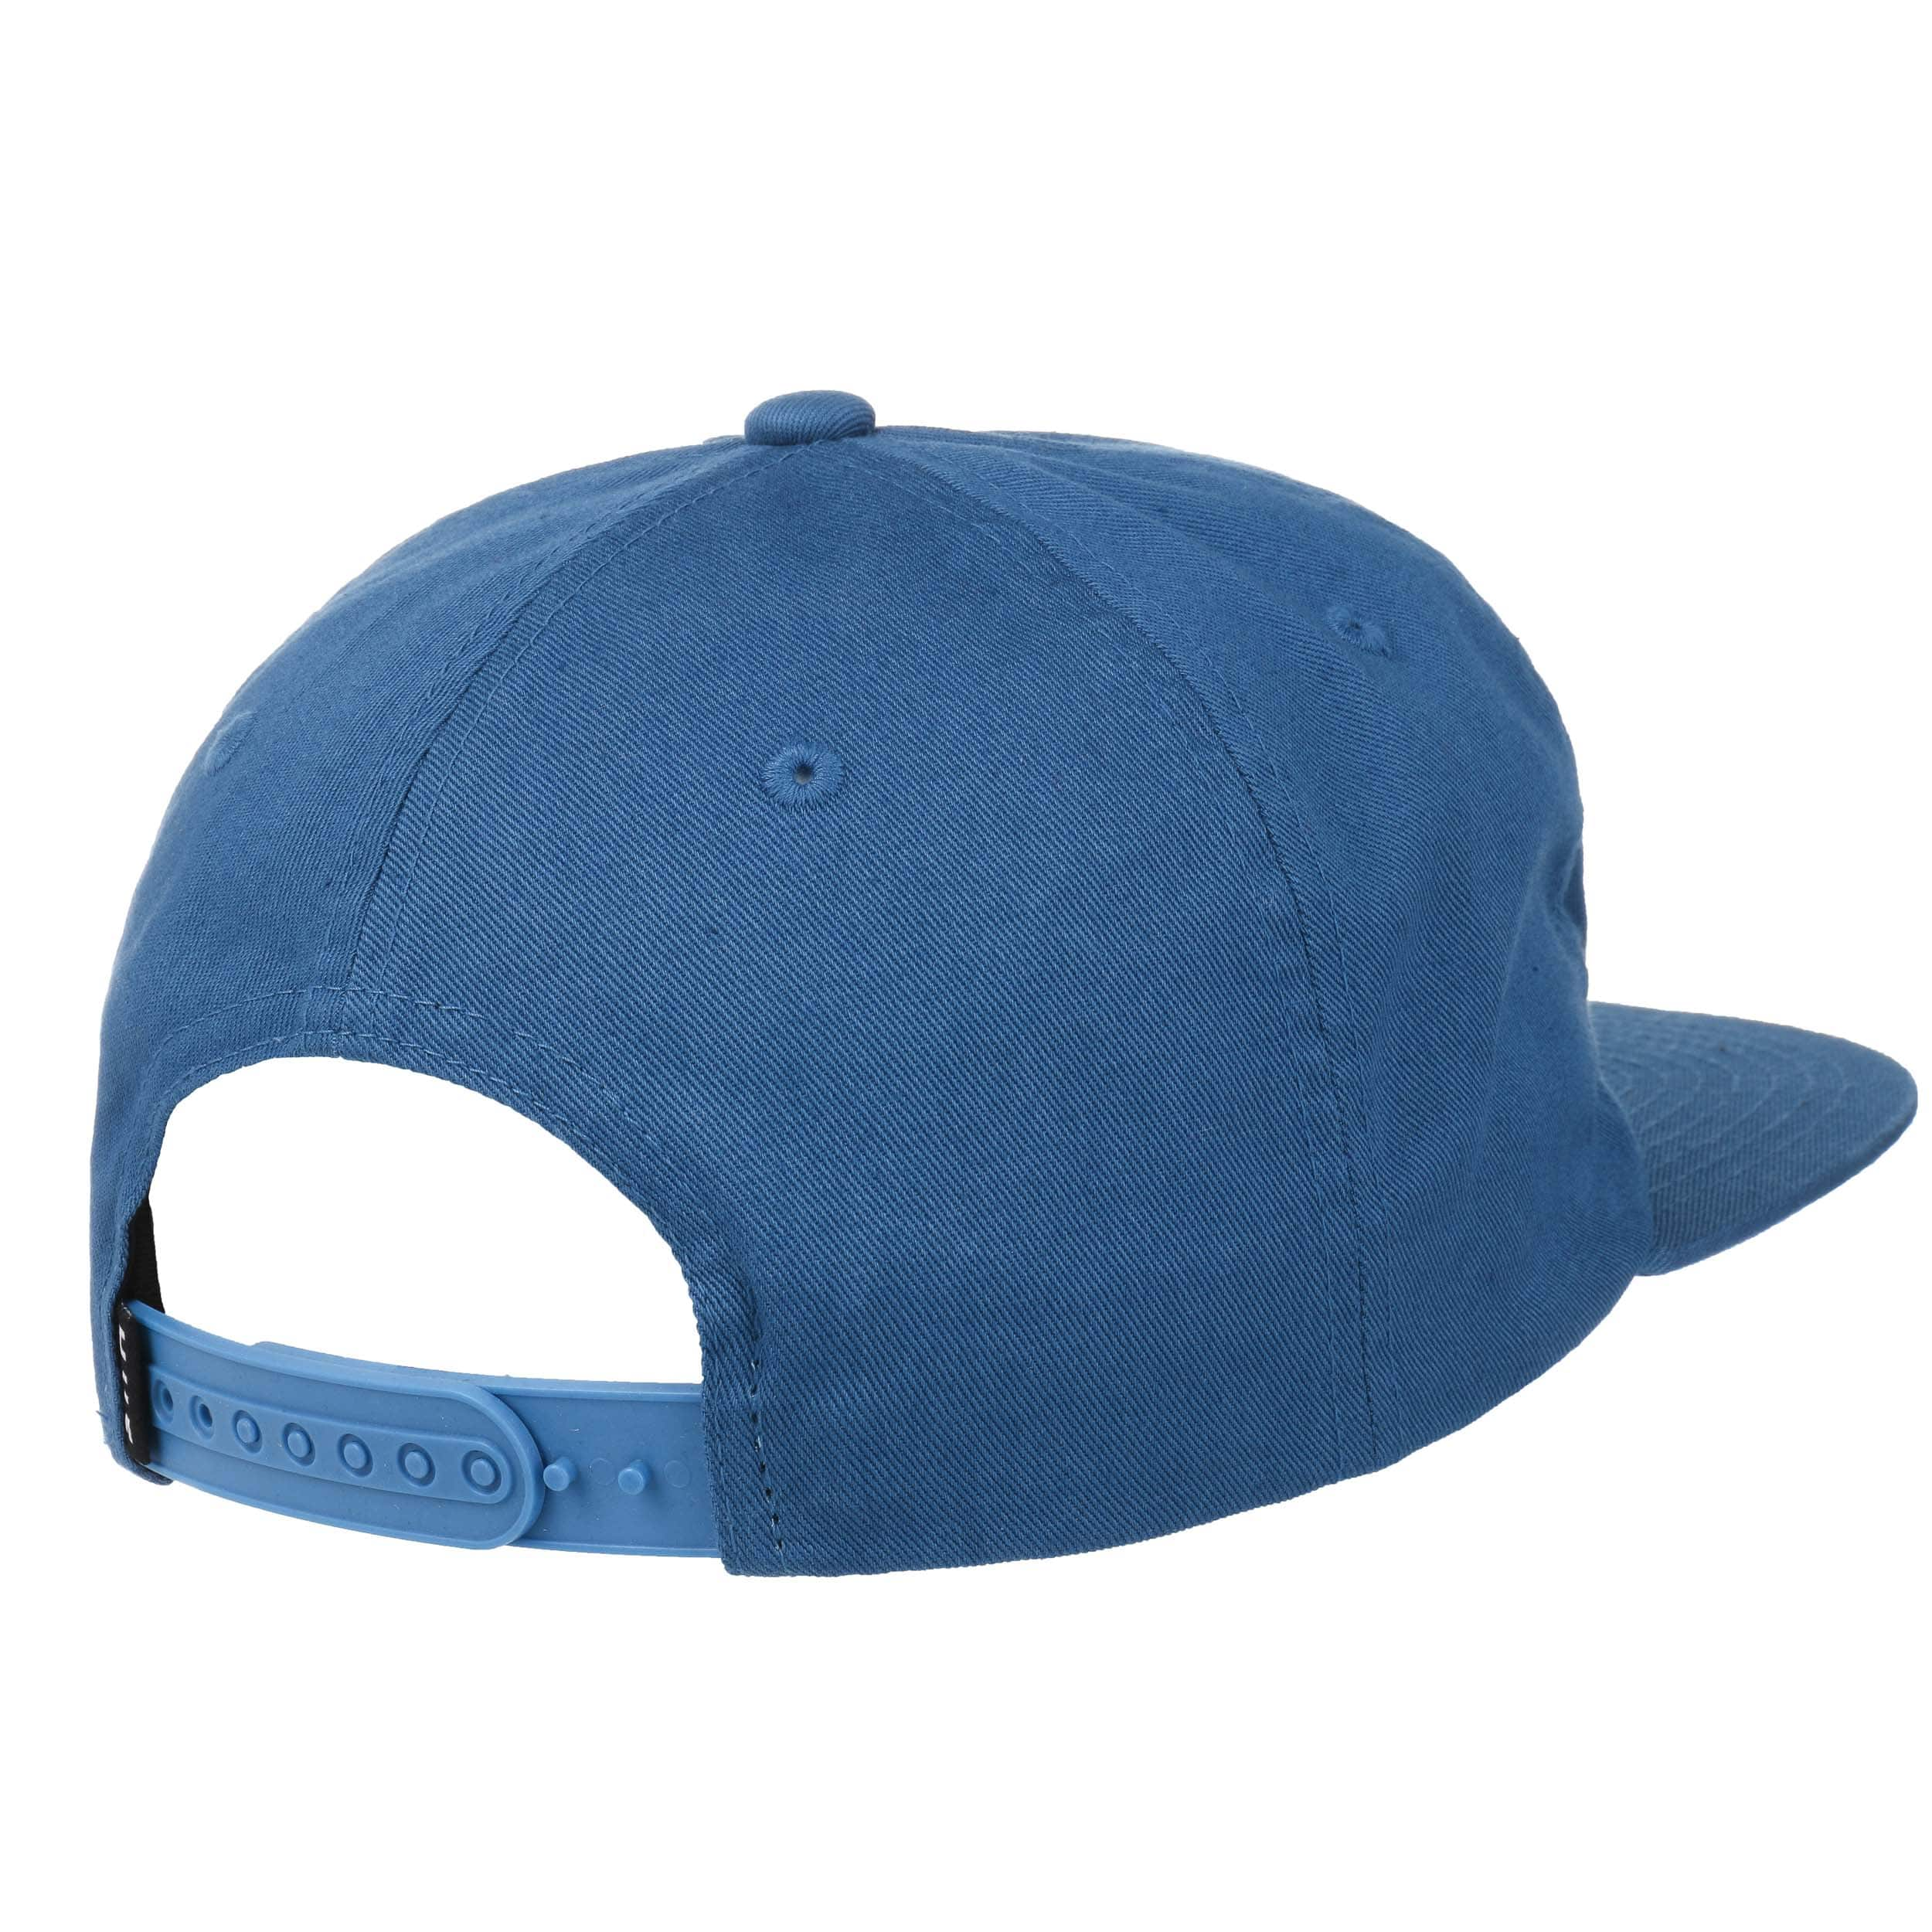 400fb378ed2 ... Washed Logo Snapback Cap by HUF - blue 3 ...